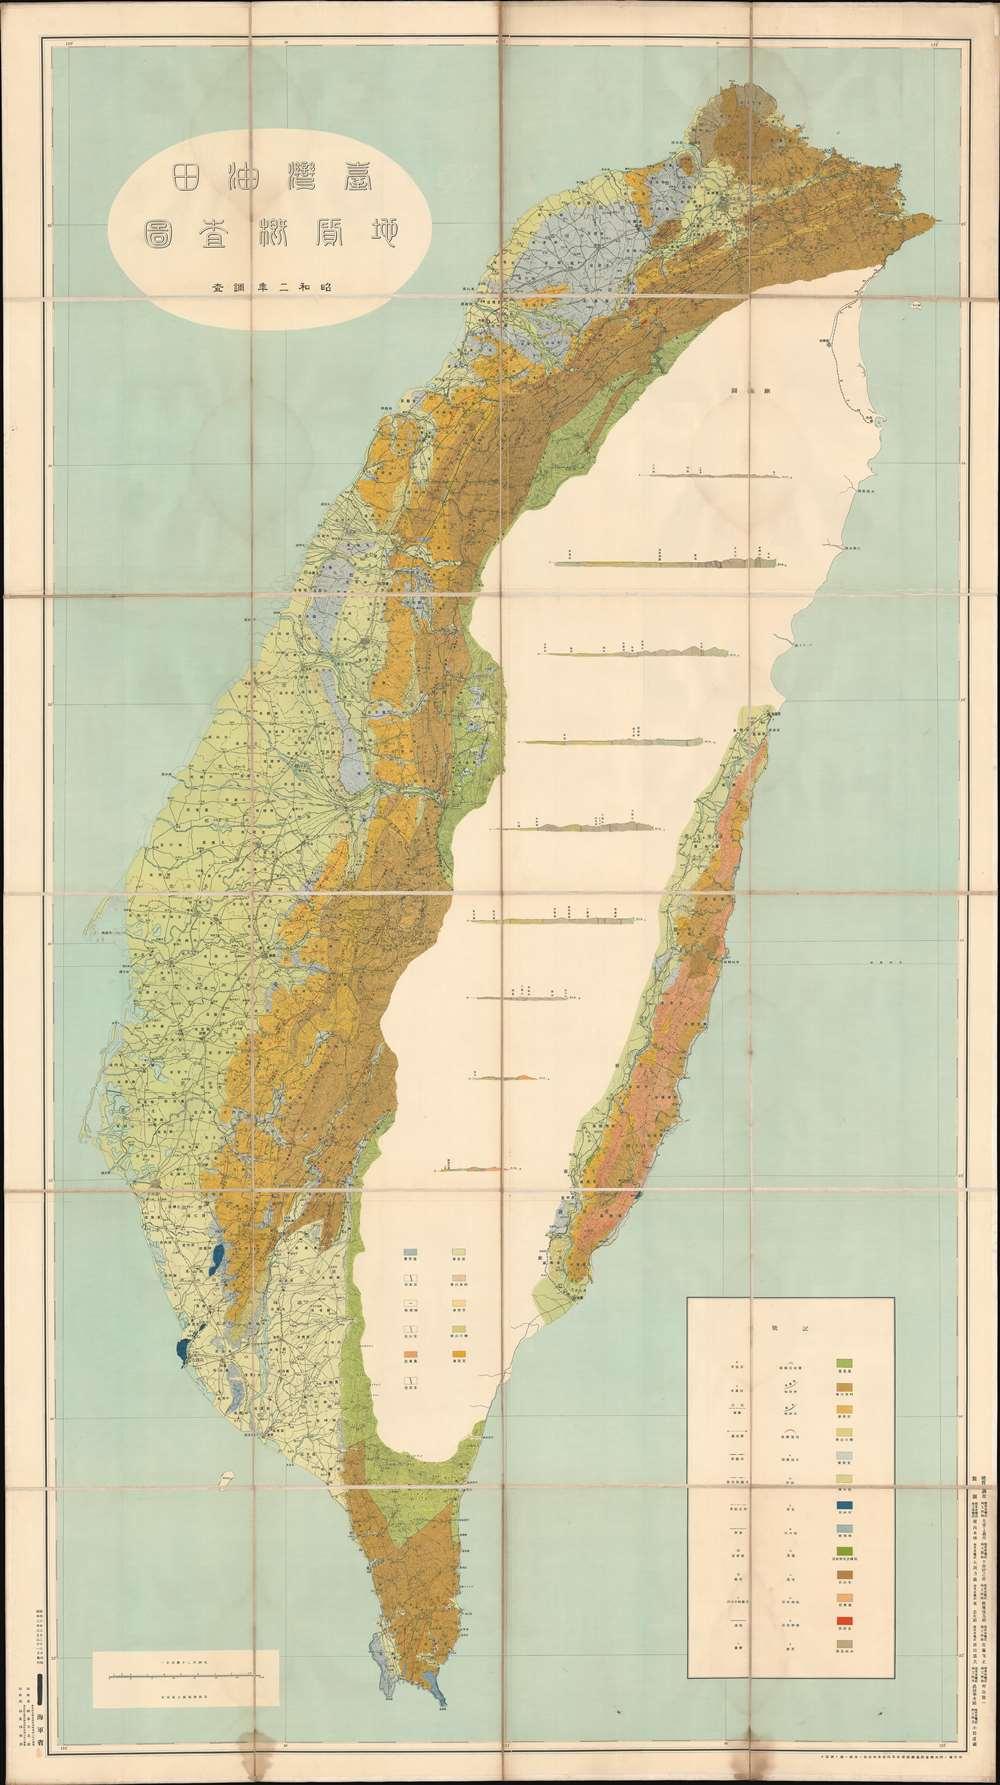 Taiwan Oilfield Geological Survey Map. / 地質概查圖台灣油田 - Main View